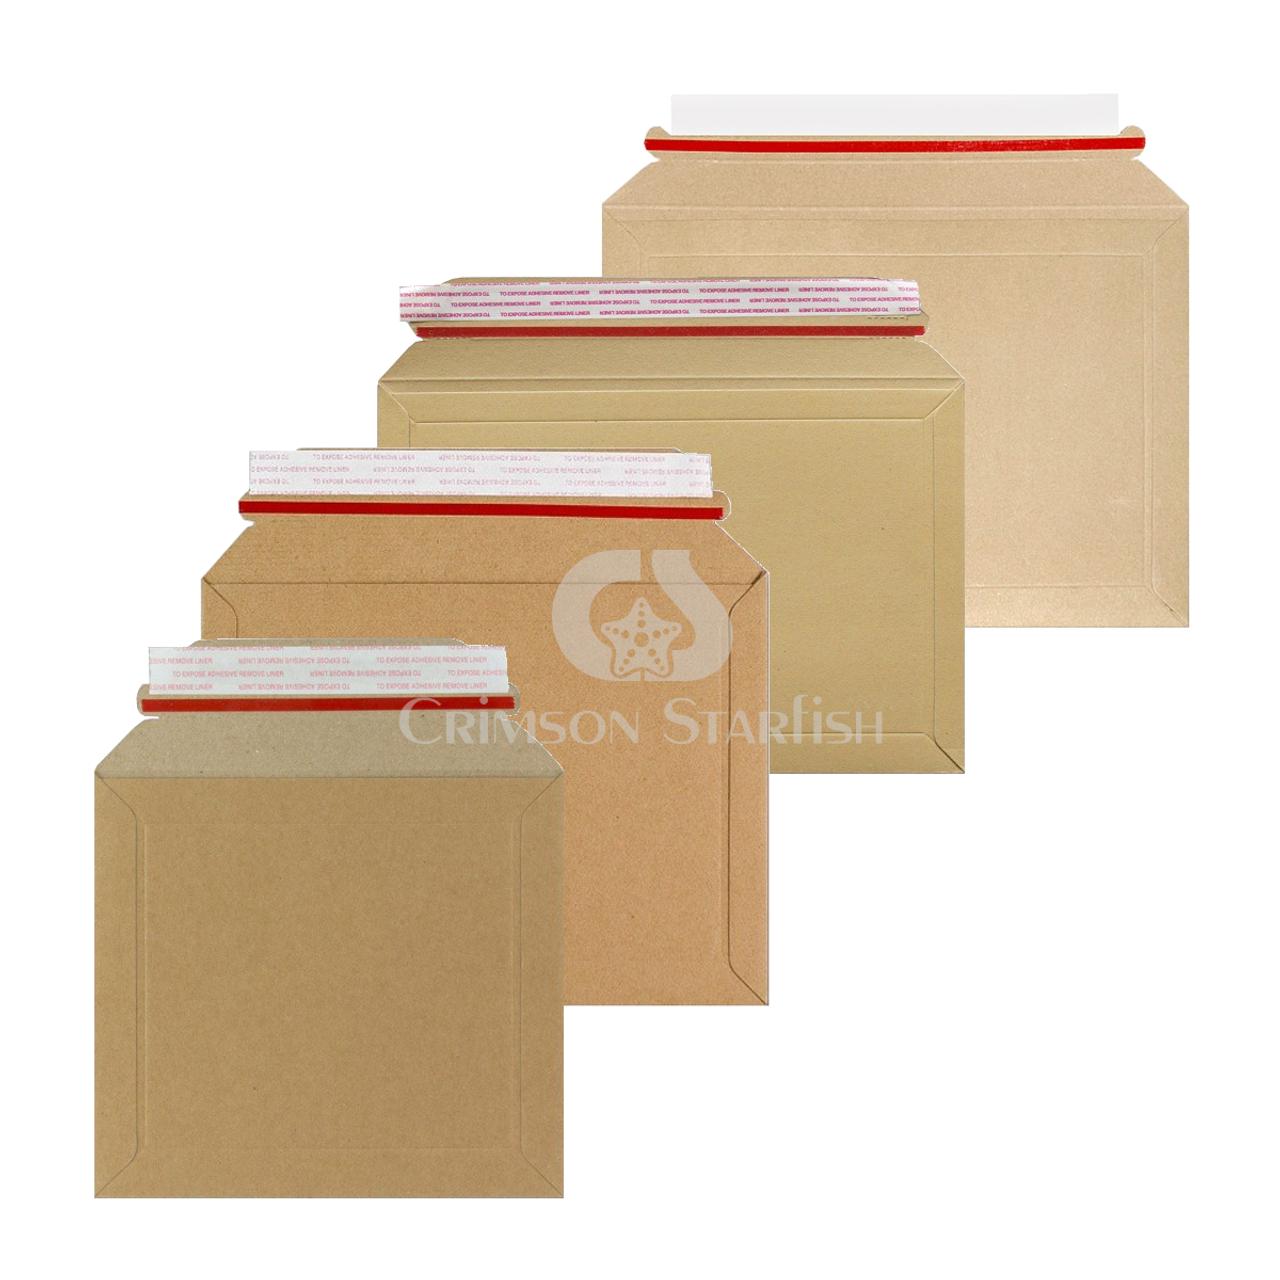 Rigid Card Envelopes